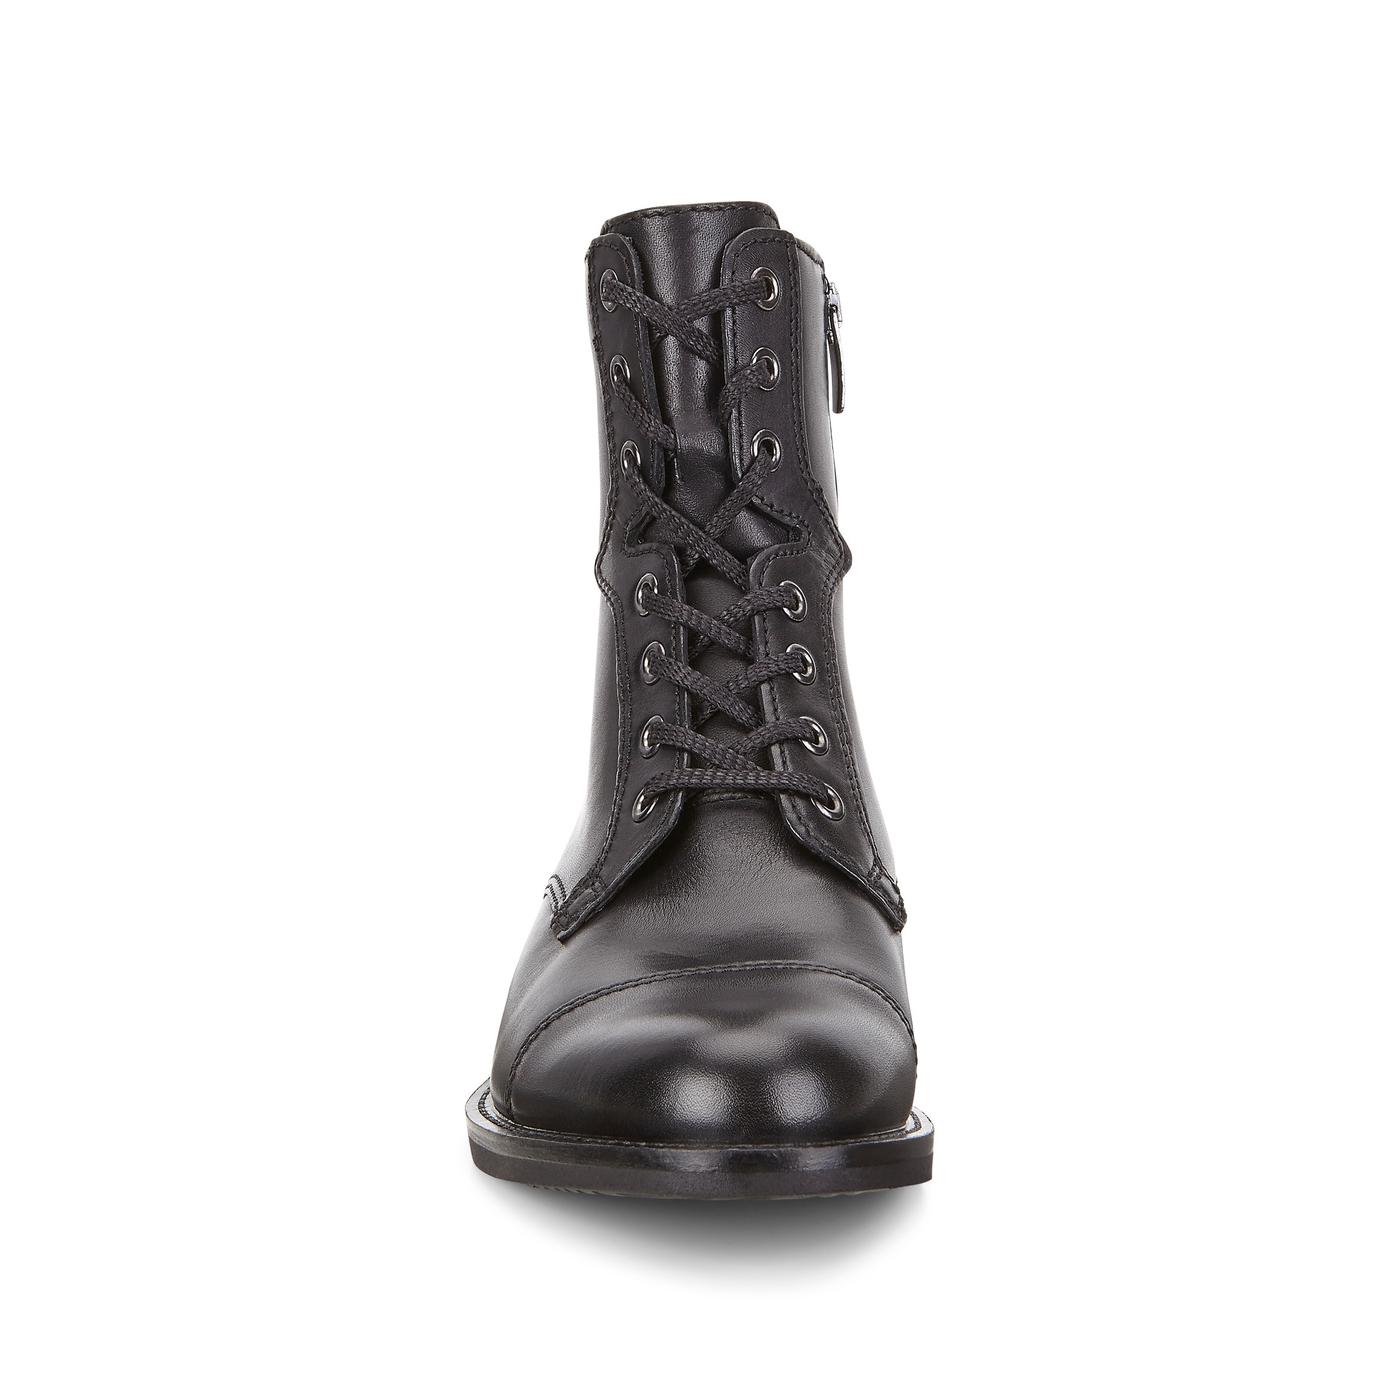 ECCO SHAPE Work Boot 25mm